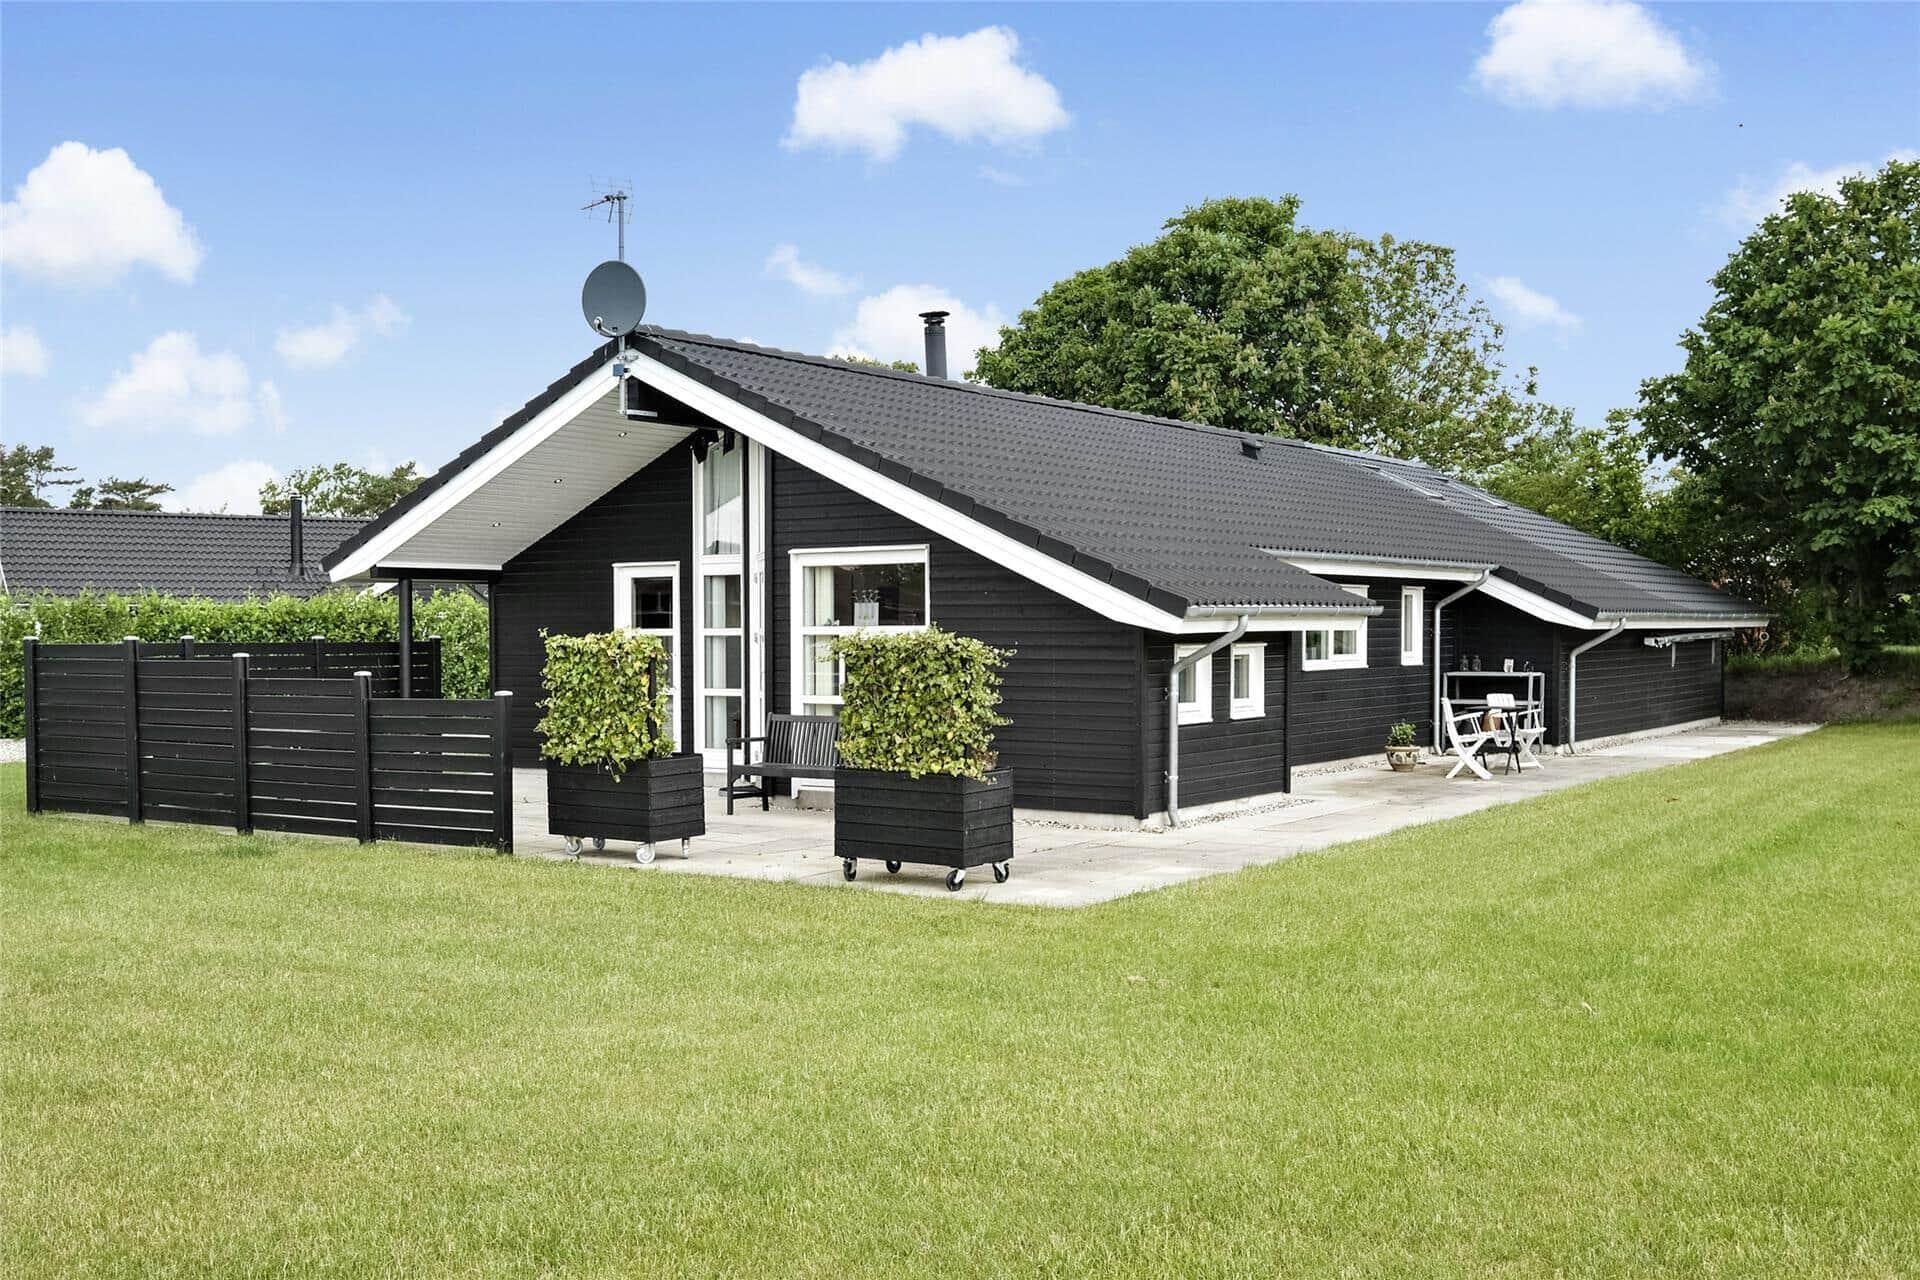 Bild 1-401 Stuga OH335, Haslevgårde Eng 15, DK - 9560 Hadsund